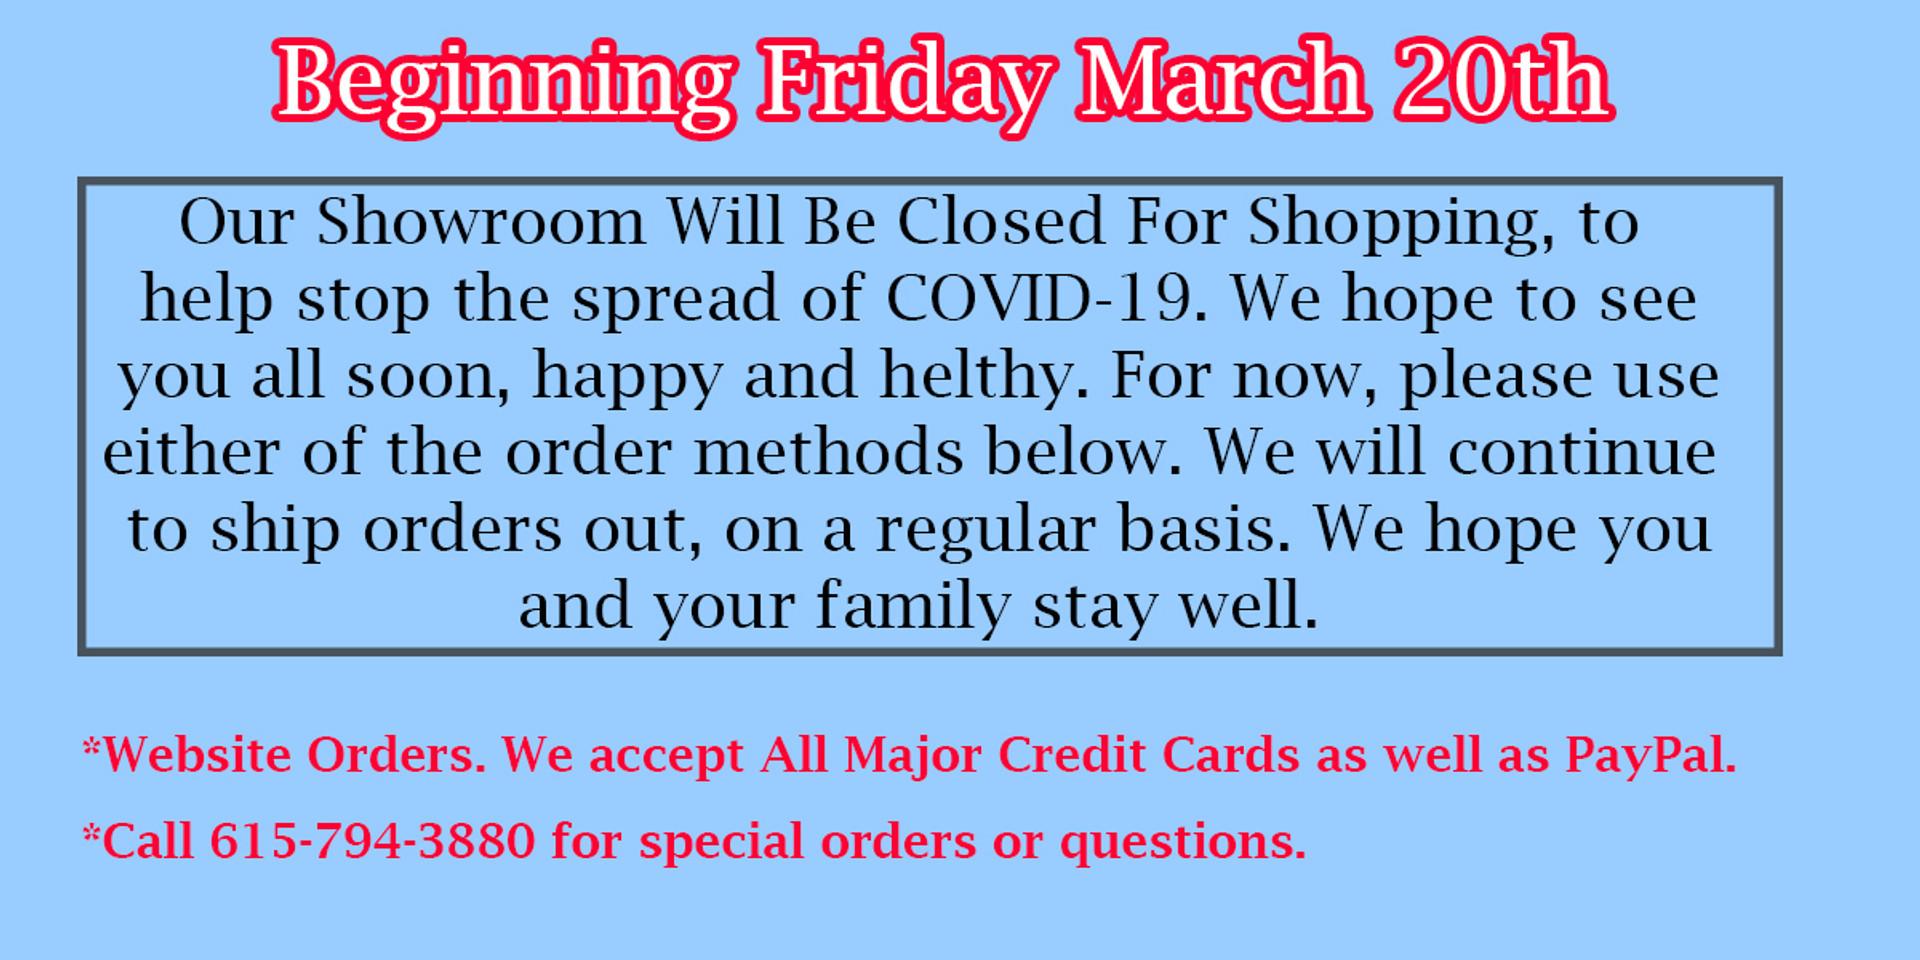 COVID-19 Showroom Closing